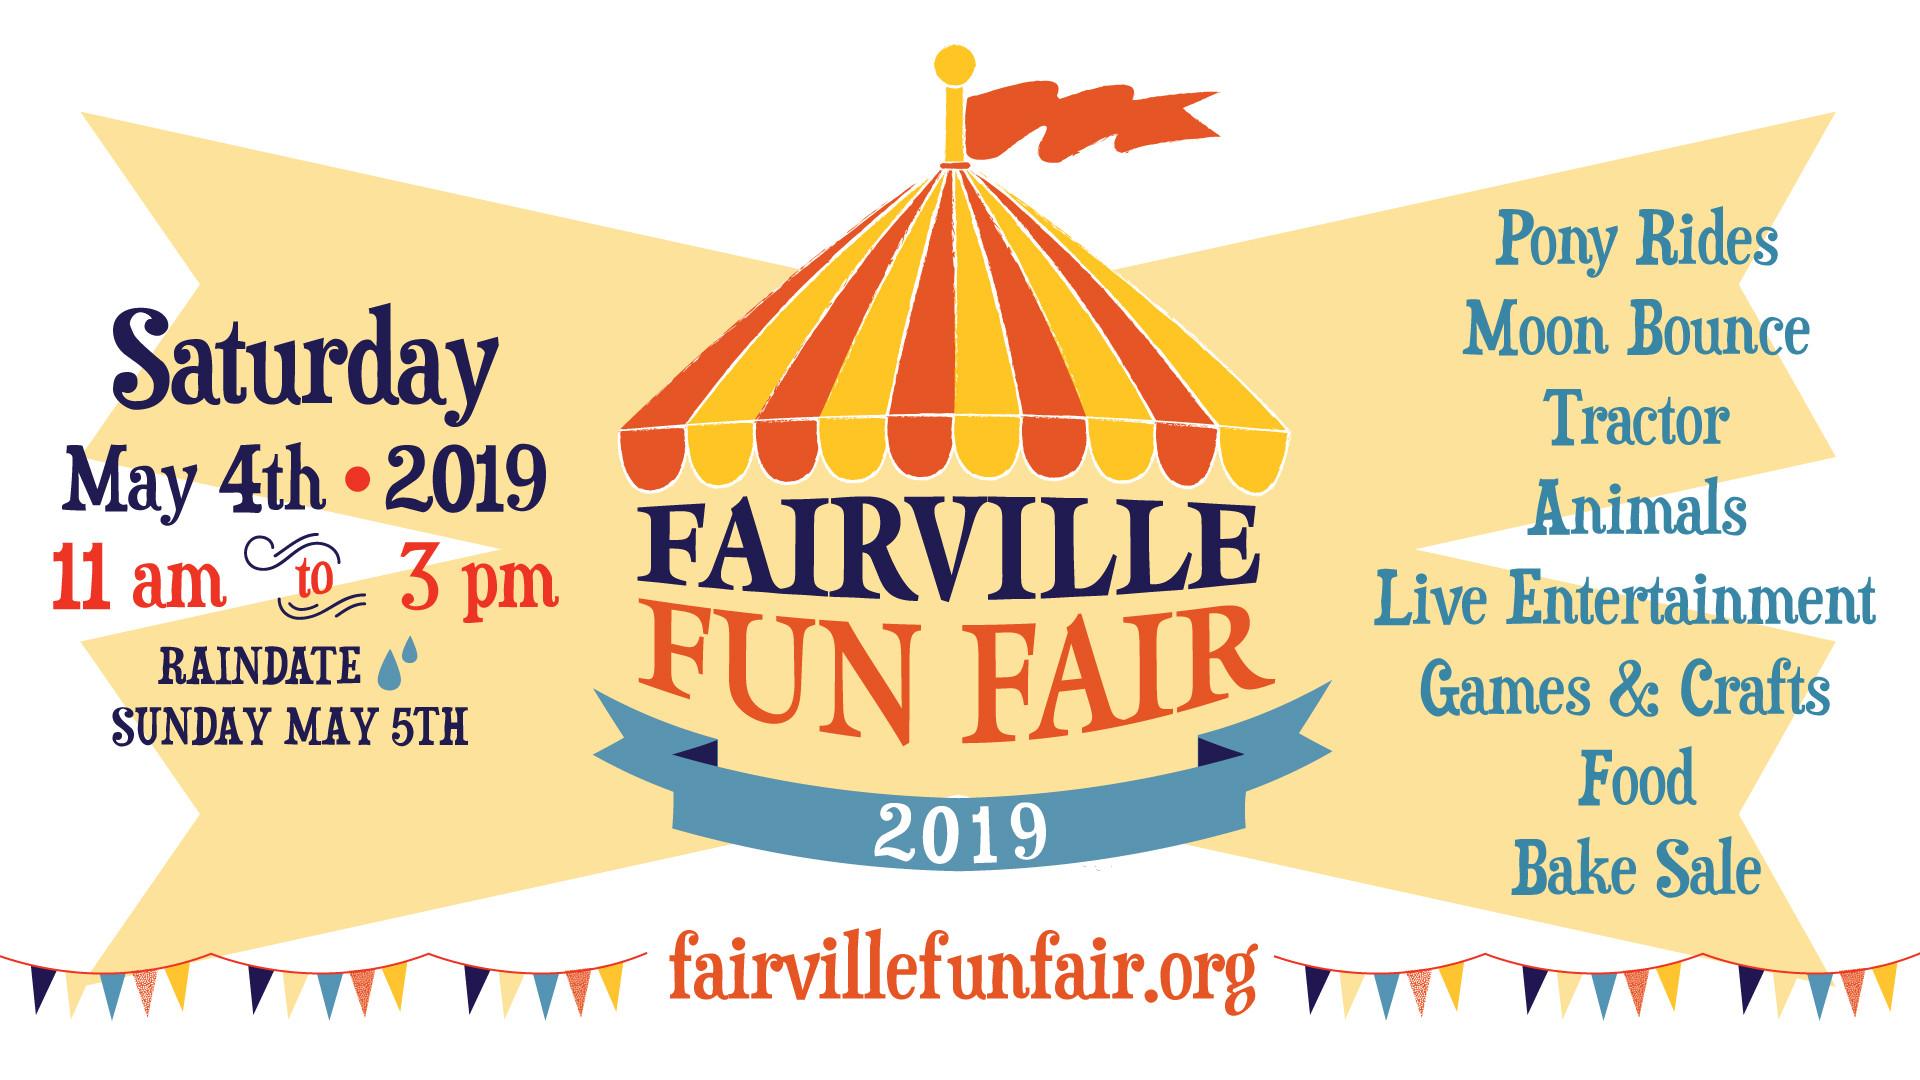 FairvilleFunFair_2019_FB.jpg